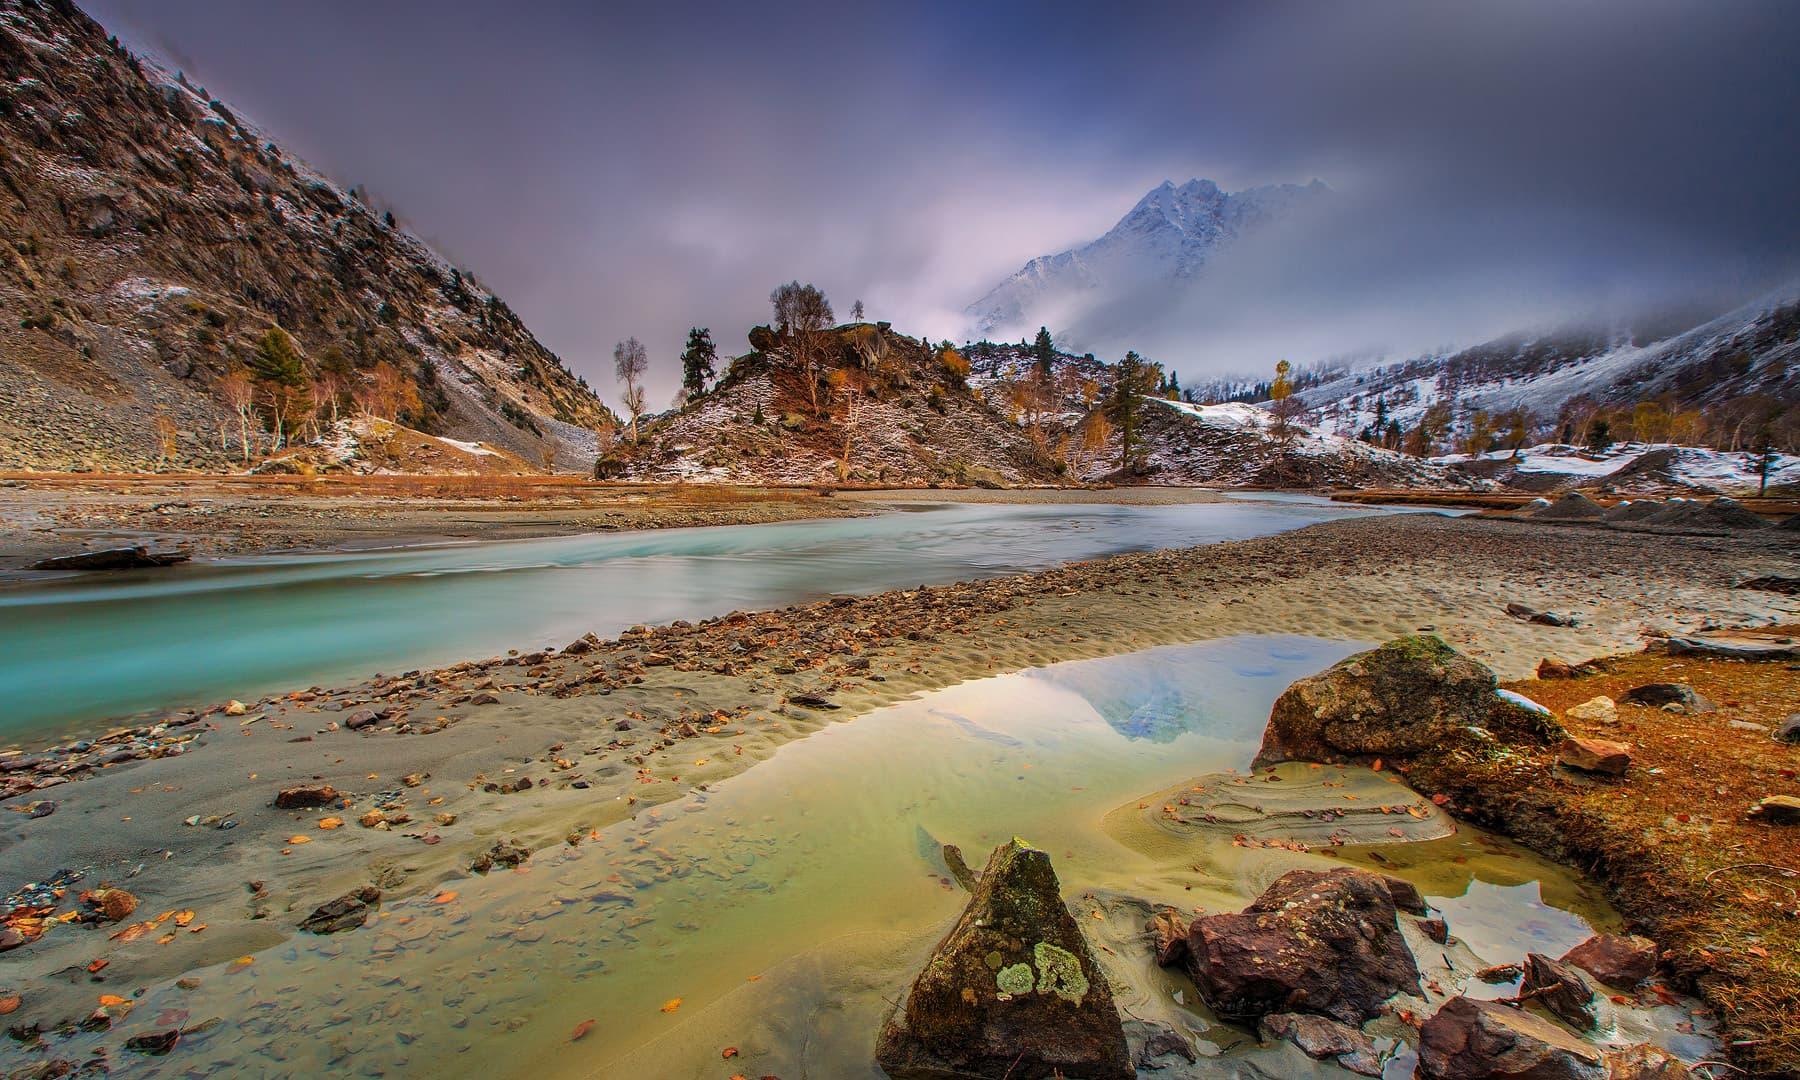 Naltar river. — Syed Mehdi Bukhari